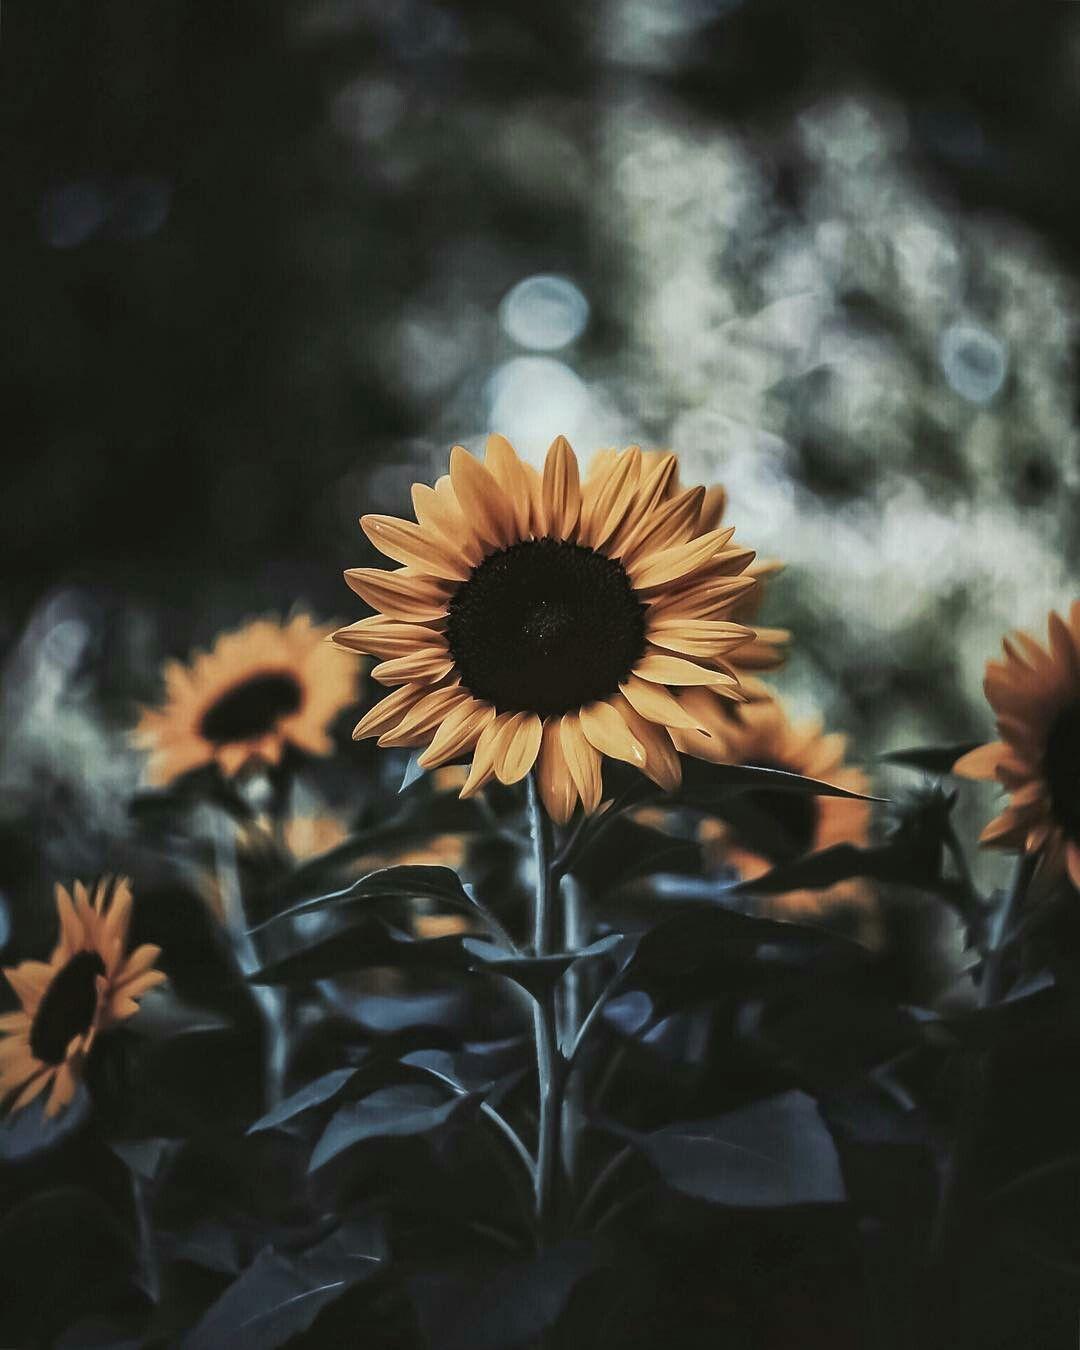 pinterest // macywillcutt ☆ Sunflower pictures